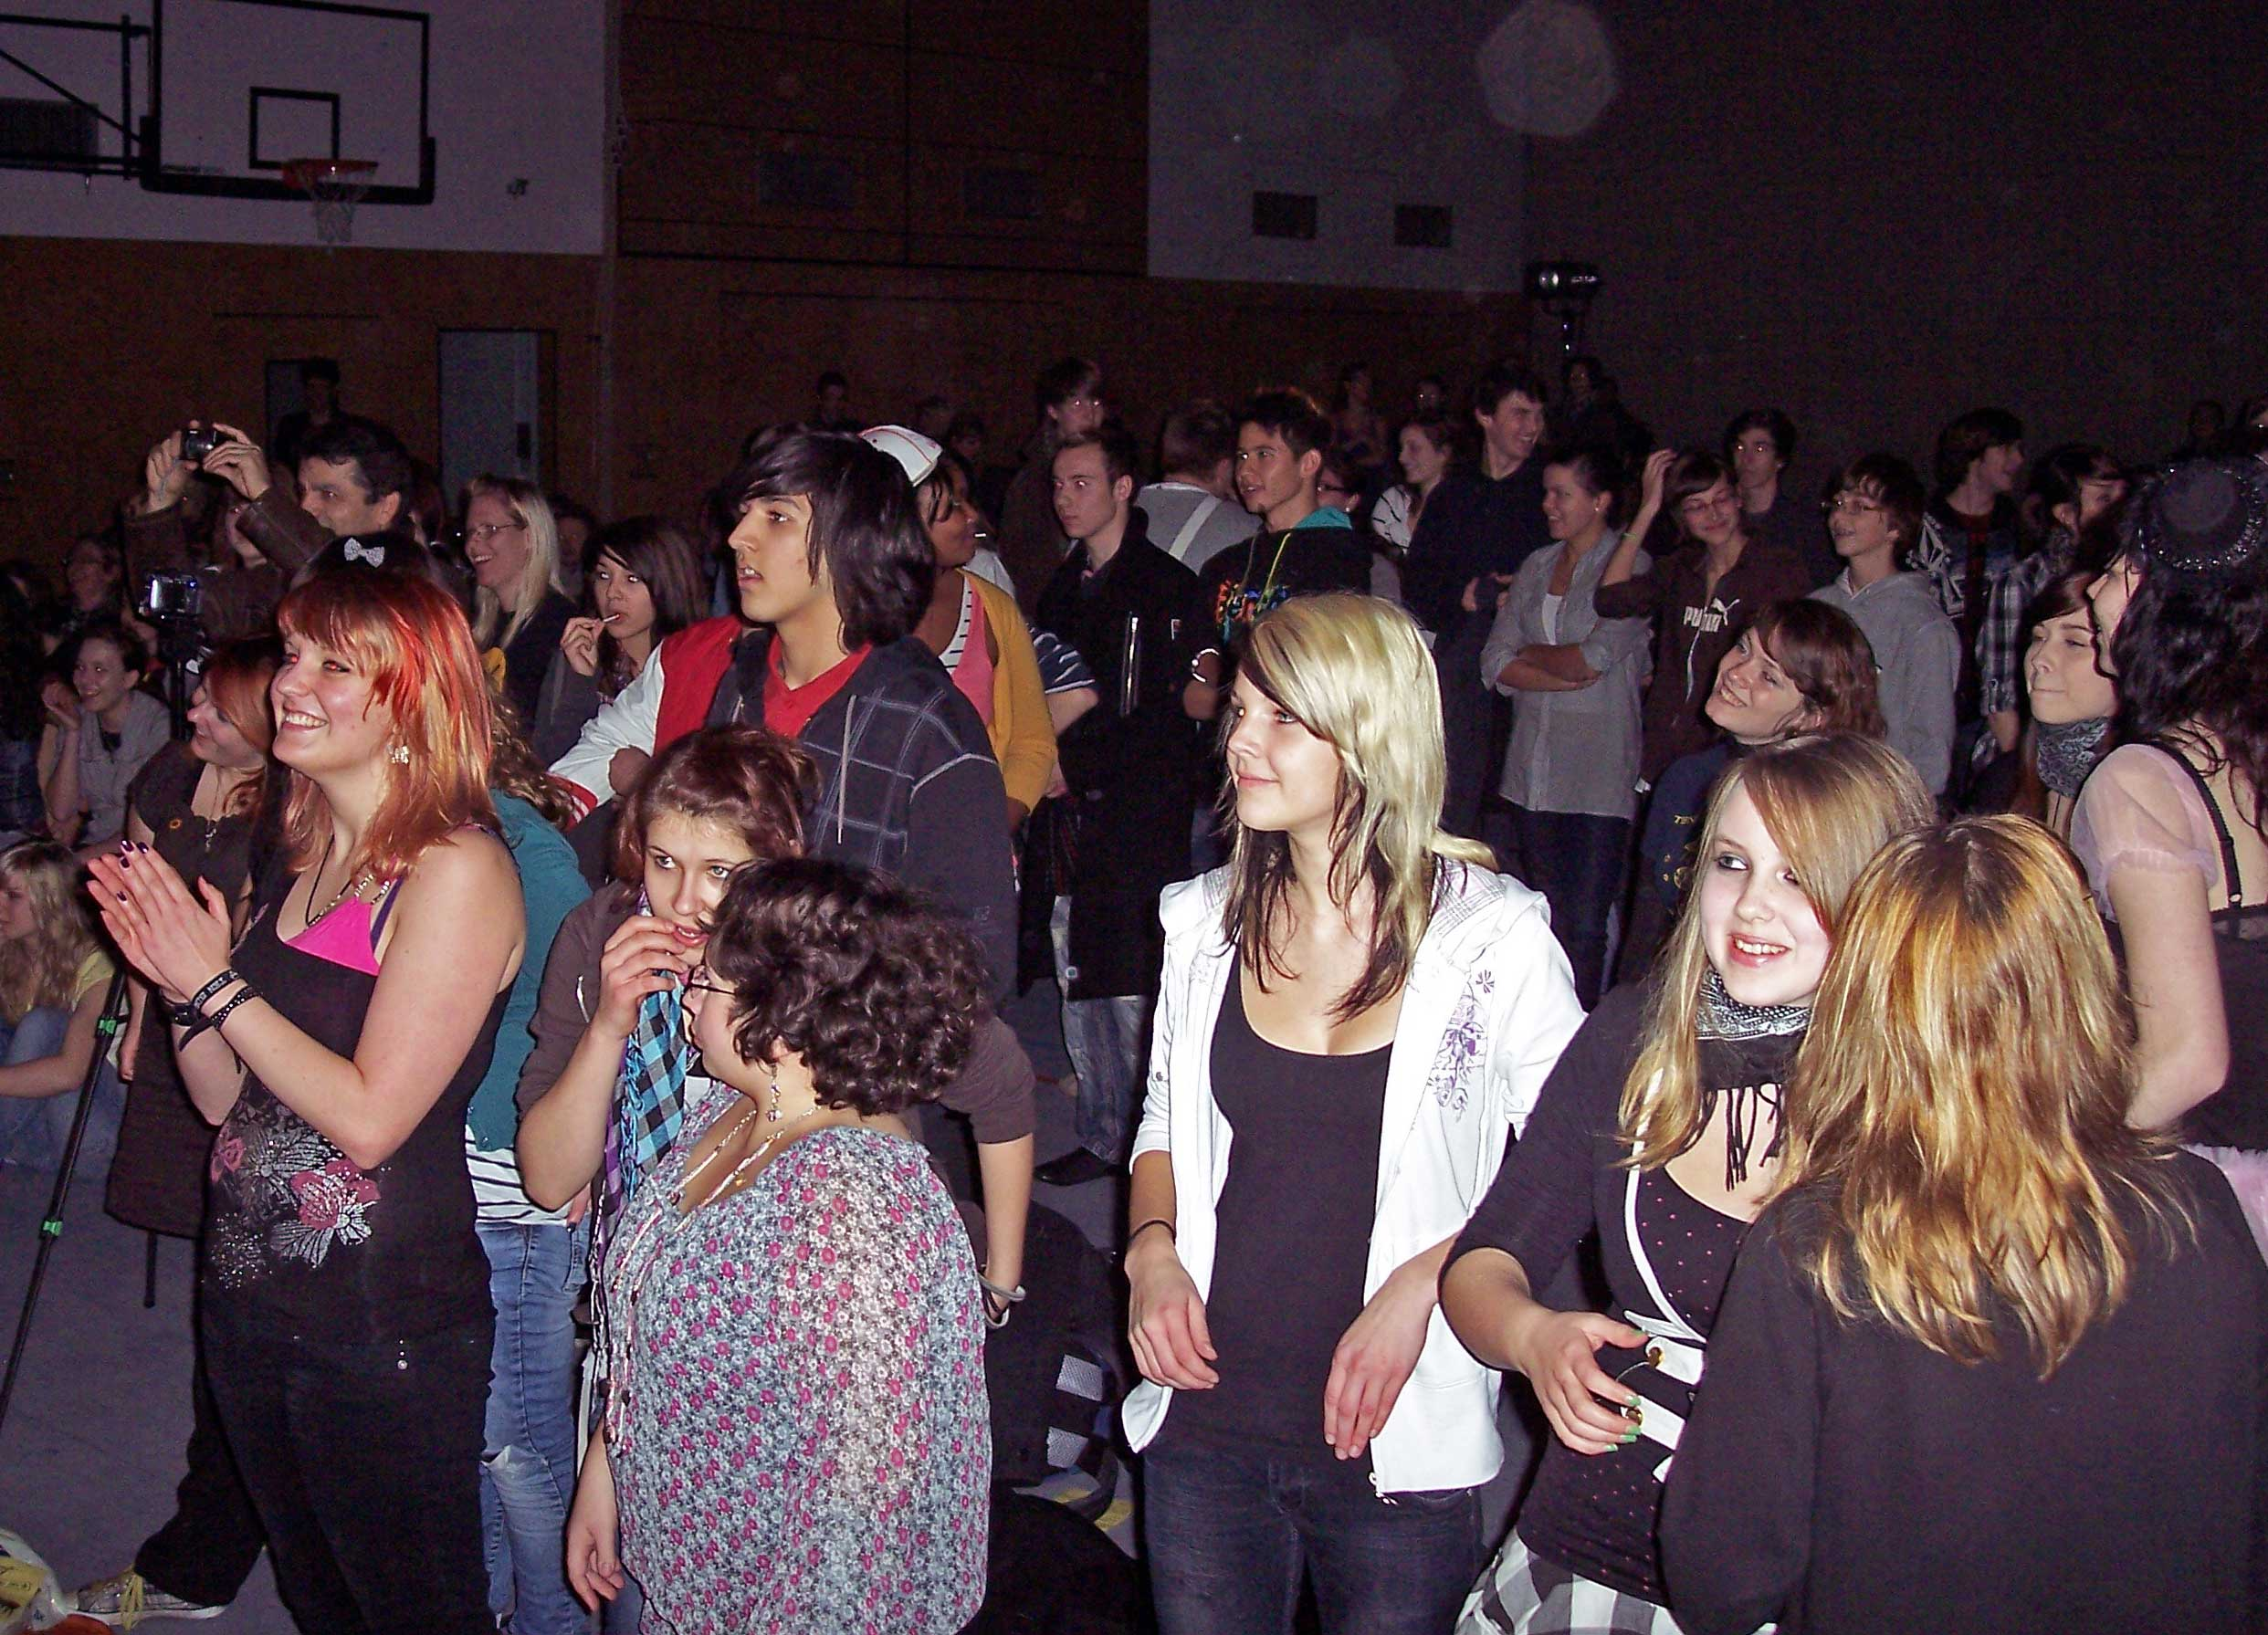 Unter dem Publikum waren viele aus anderen Ten Sing-Gruppen. (Foto: jl)